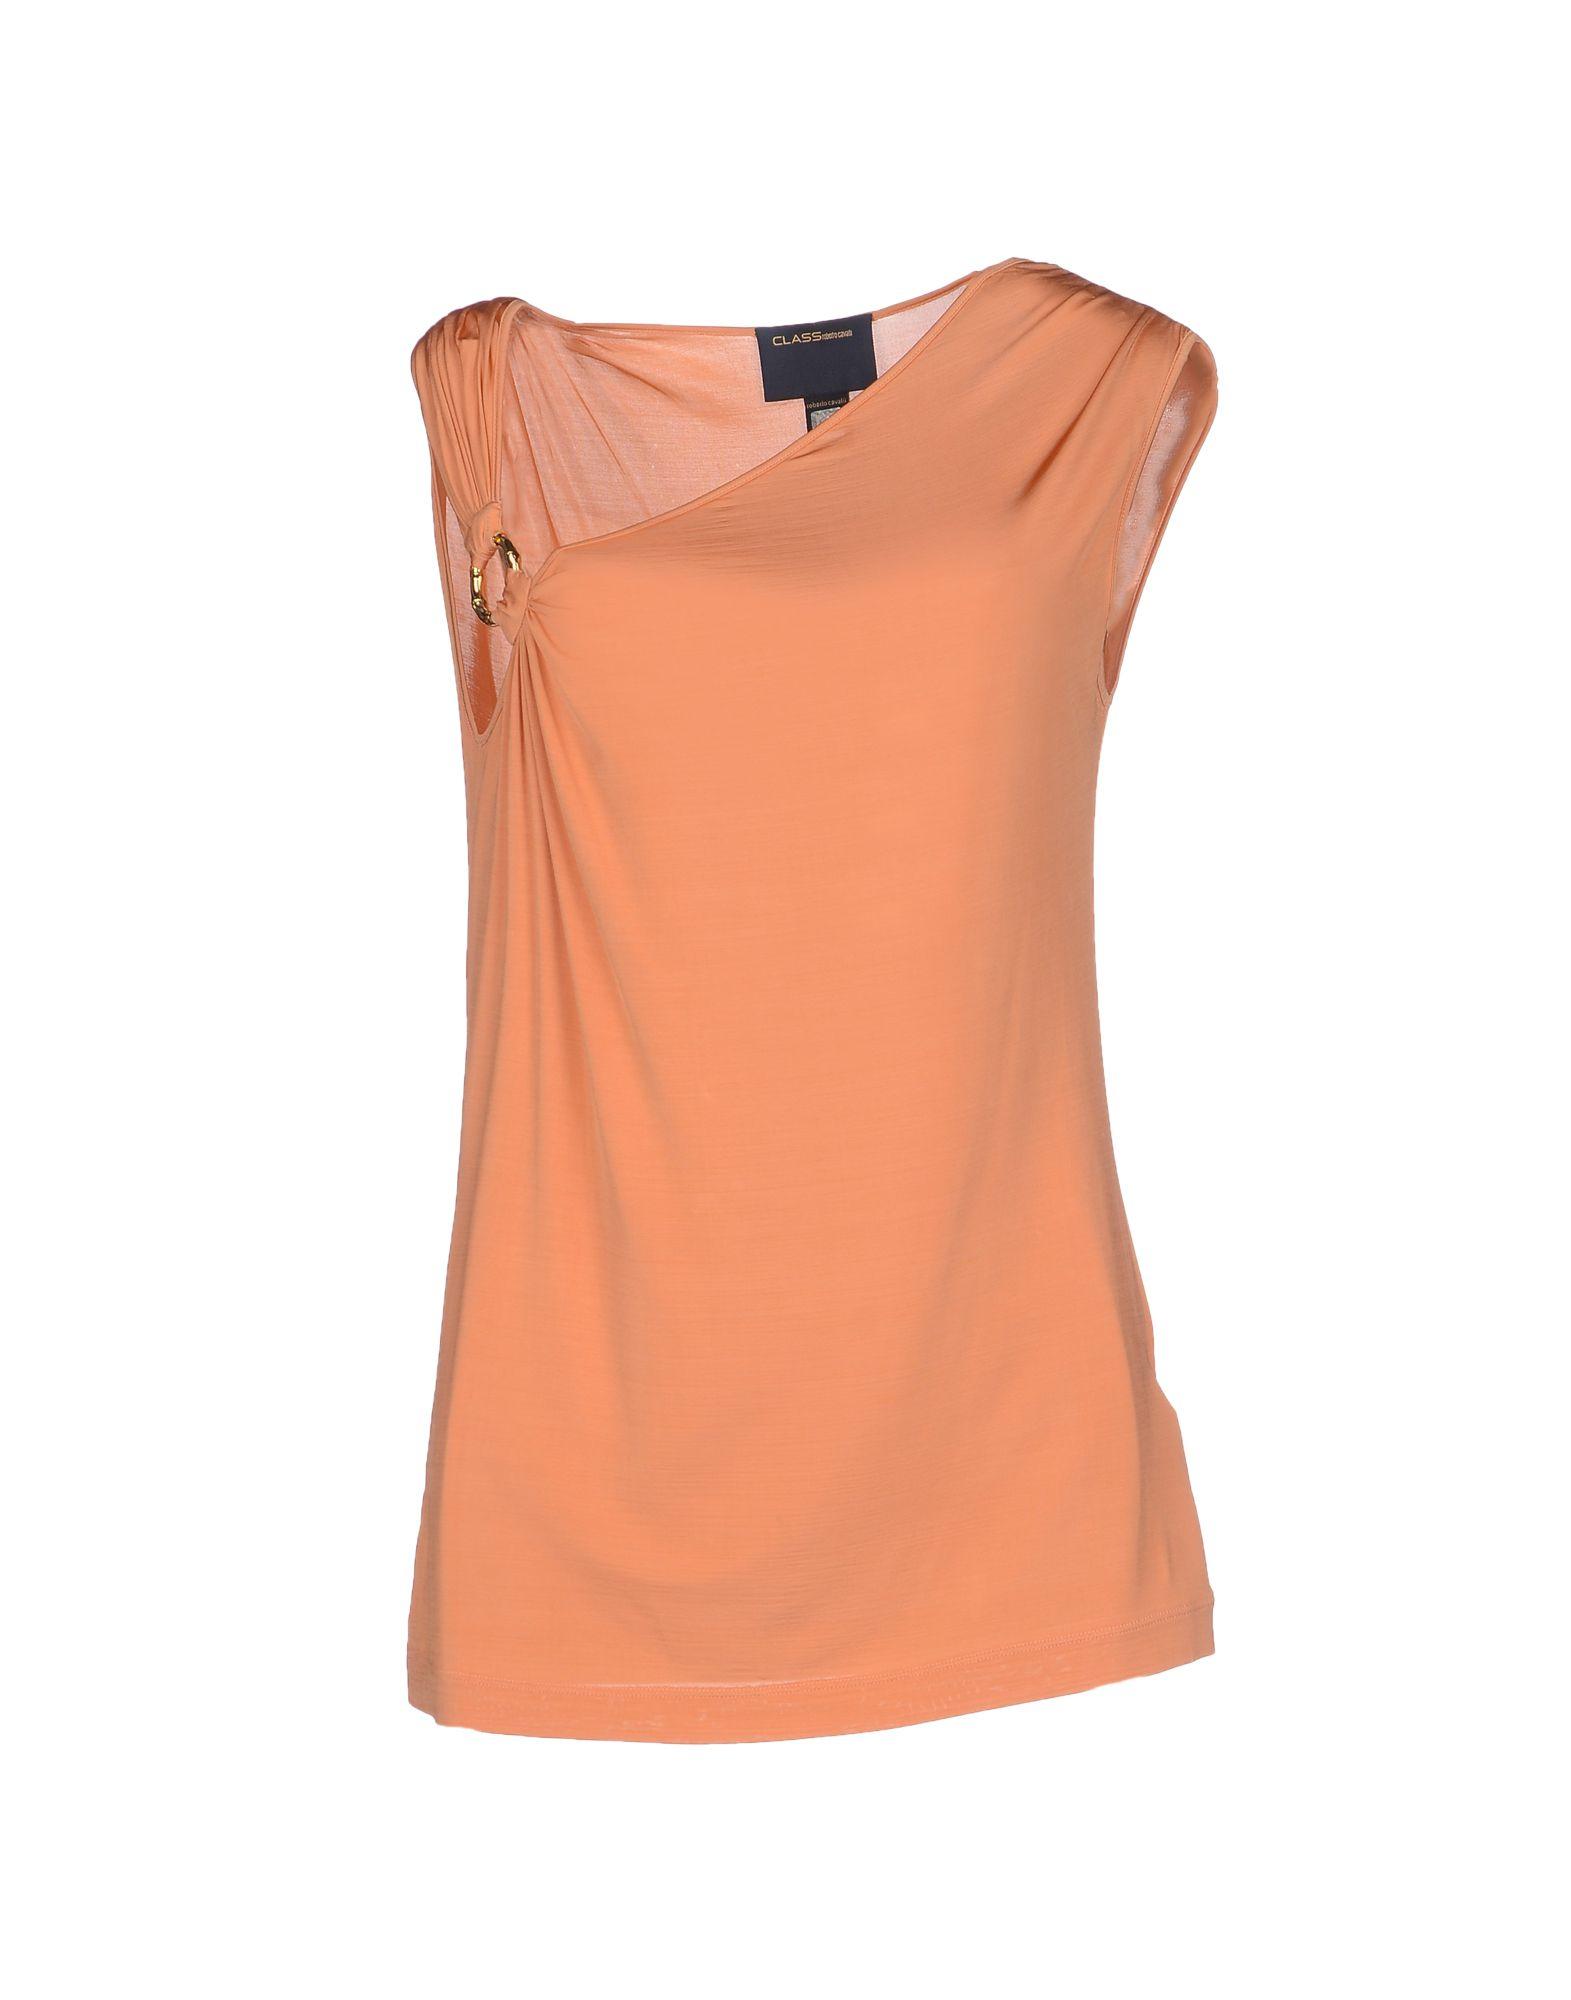 Orange Top With Umbrella Sleeves The Vanca: Class Roberto Cavalli Top In Orange